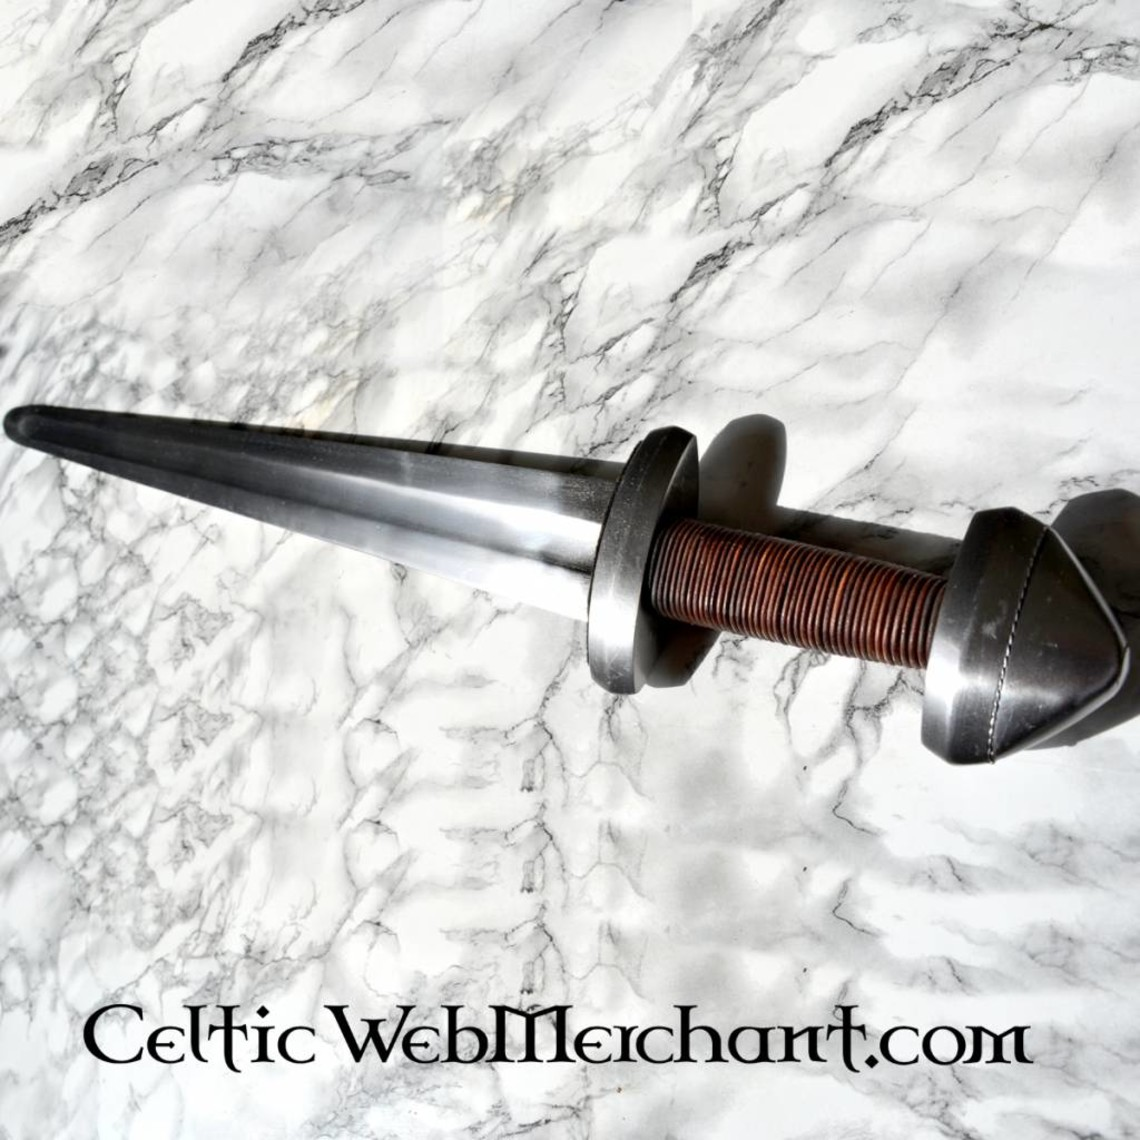 Deepeeka Epée Viking Torshov, 9ème siècle, prête au combat